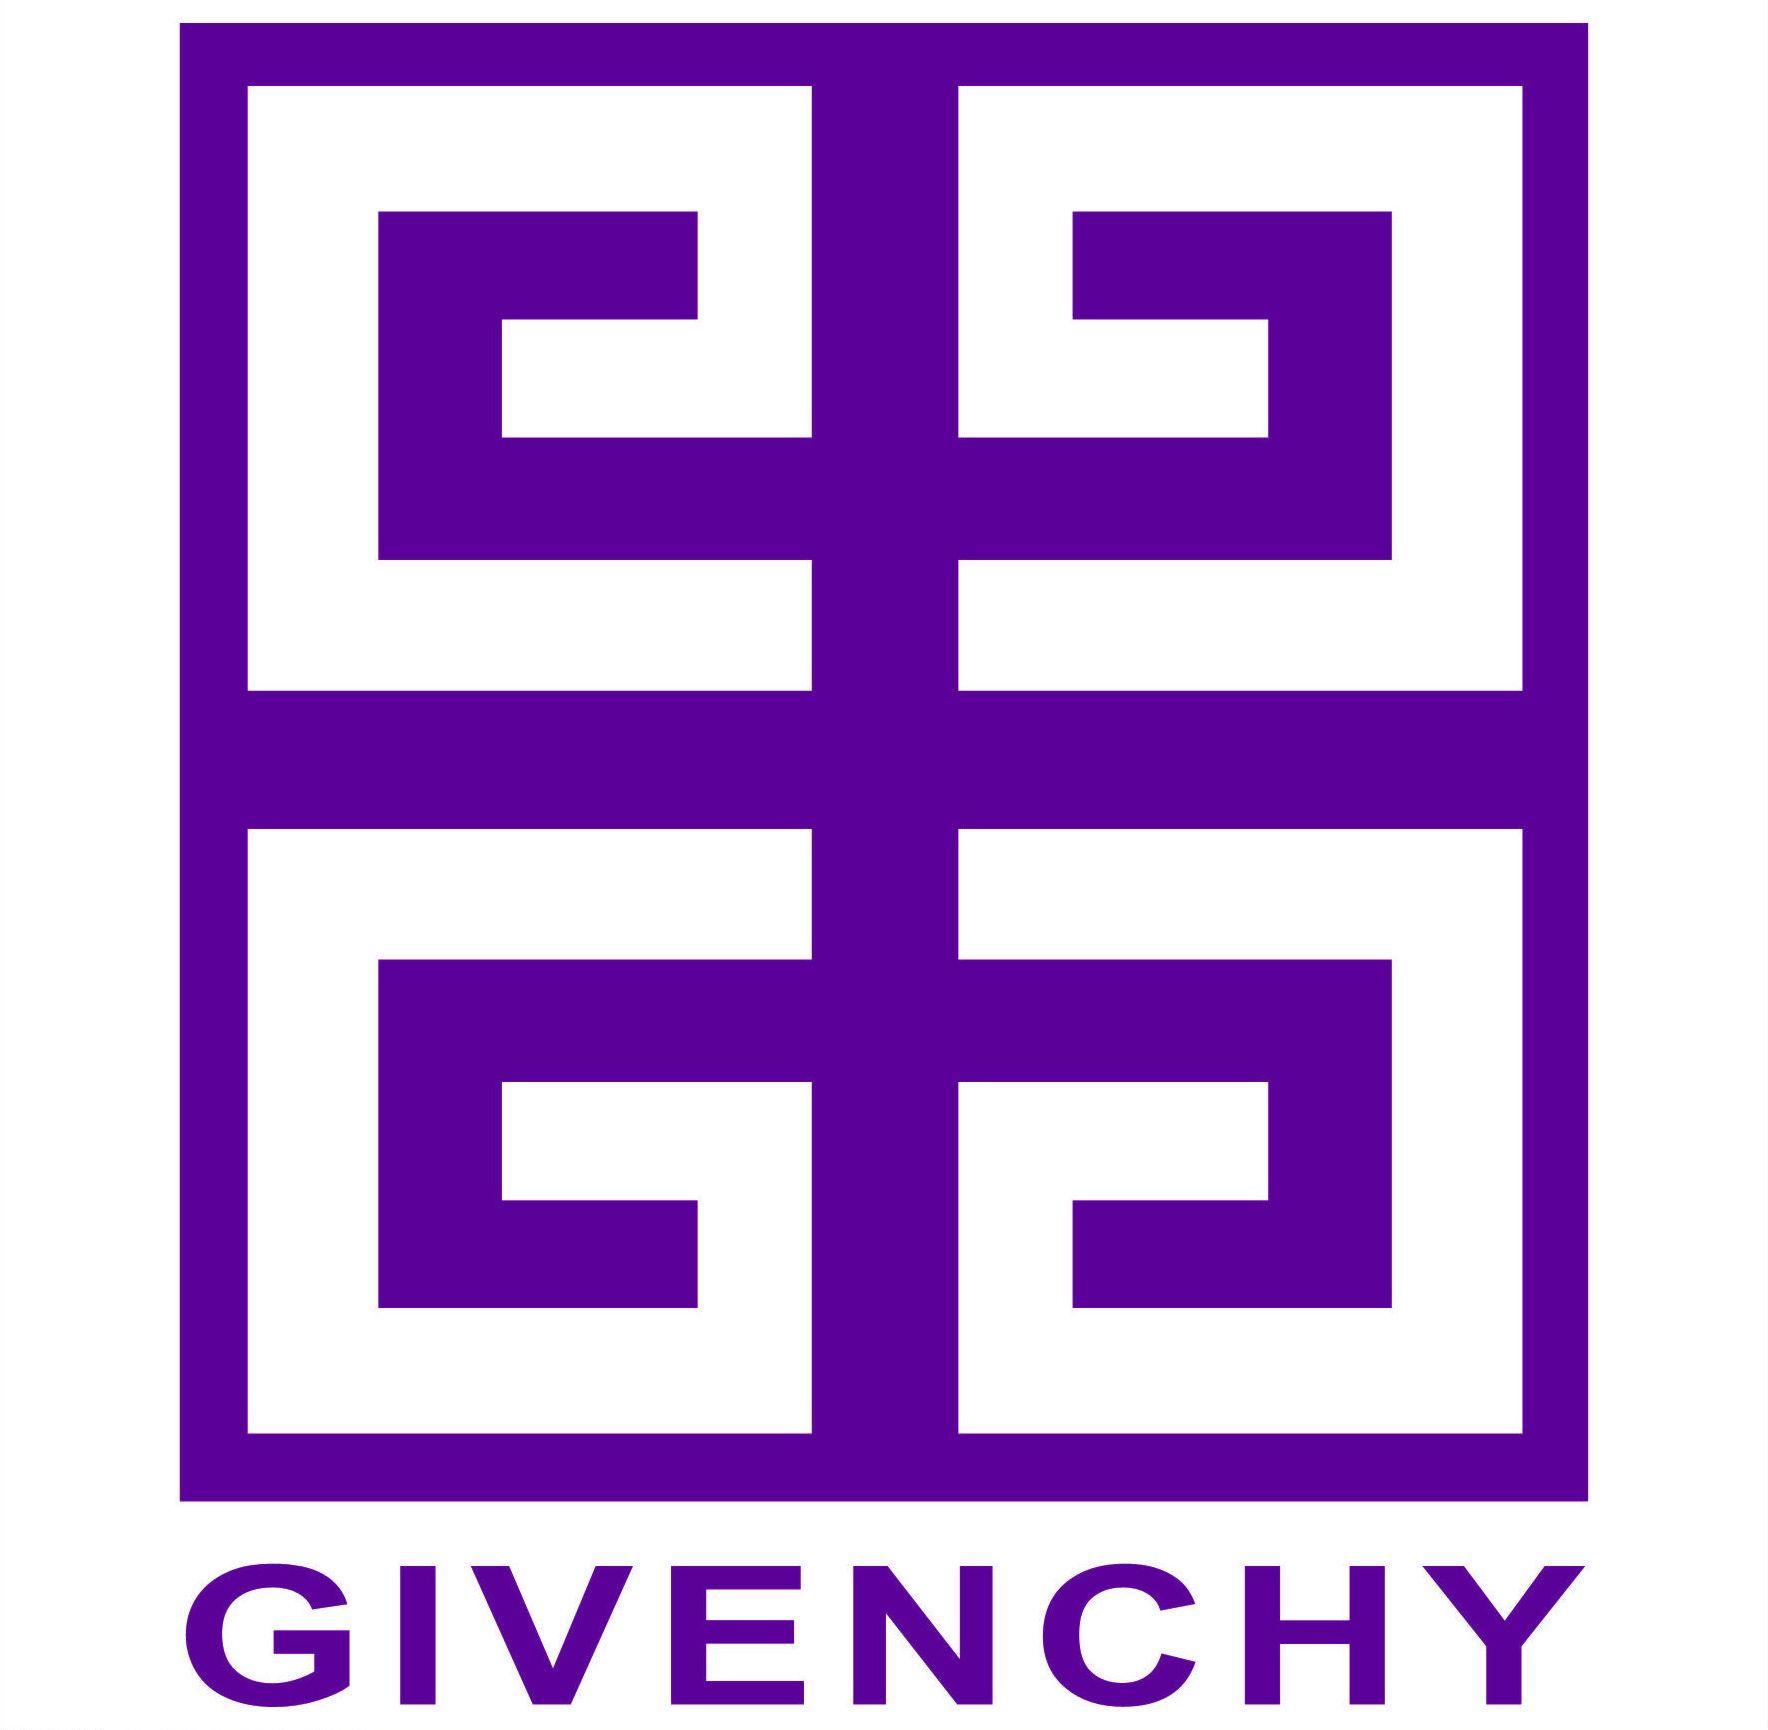 Givenchy | Logos | Pinterest | Givenchy